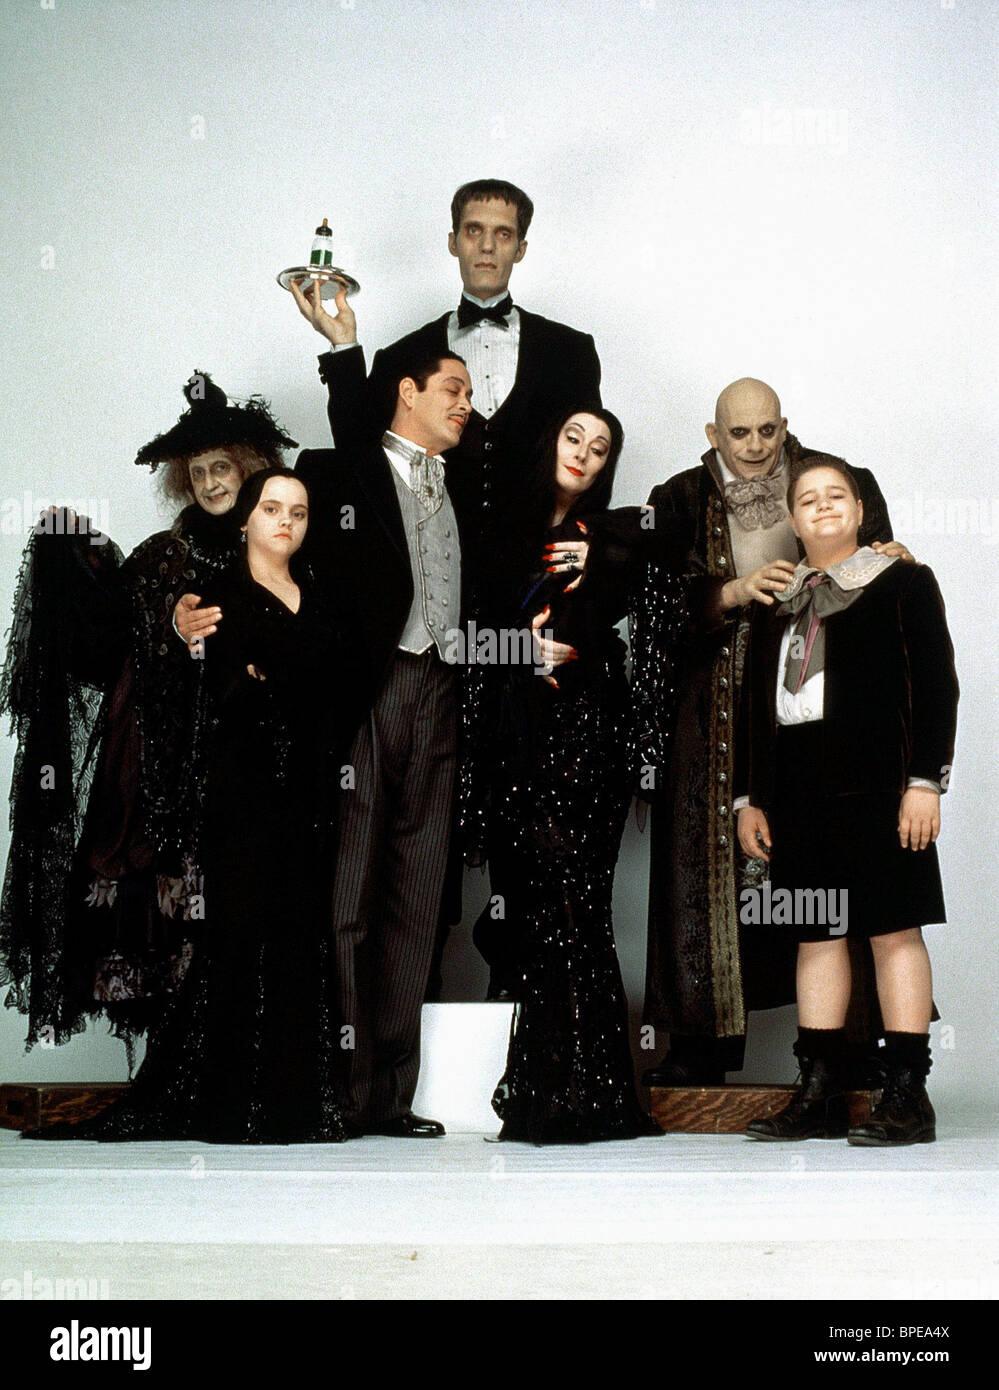 CAROL KANE, CHRISTINA RICCI, RAUL JULIA, CAREL STRUYCKEN, ANJELICA HUSTON, CHRISTOPHER LLOYD, JIMMY WORKMAN, ADDAMS FAMILY VALUES, 1993